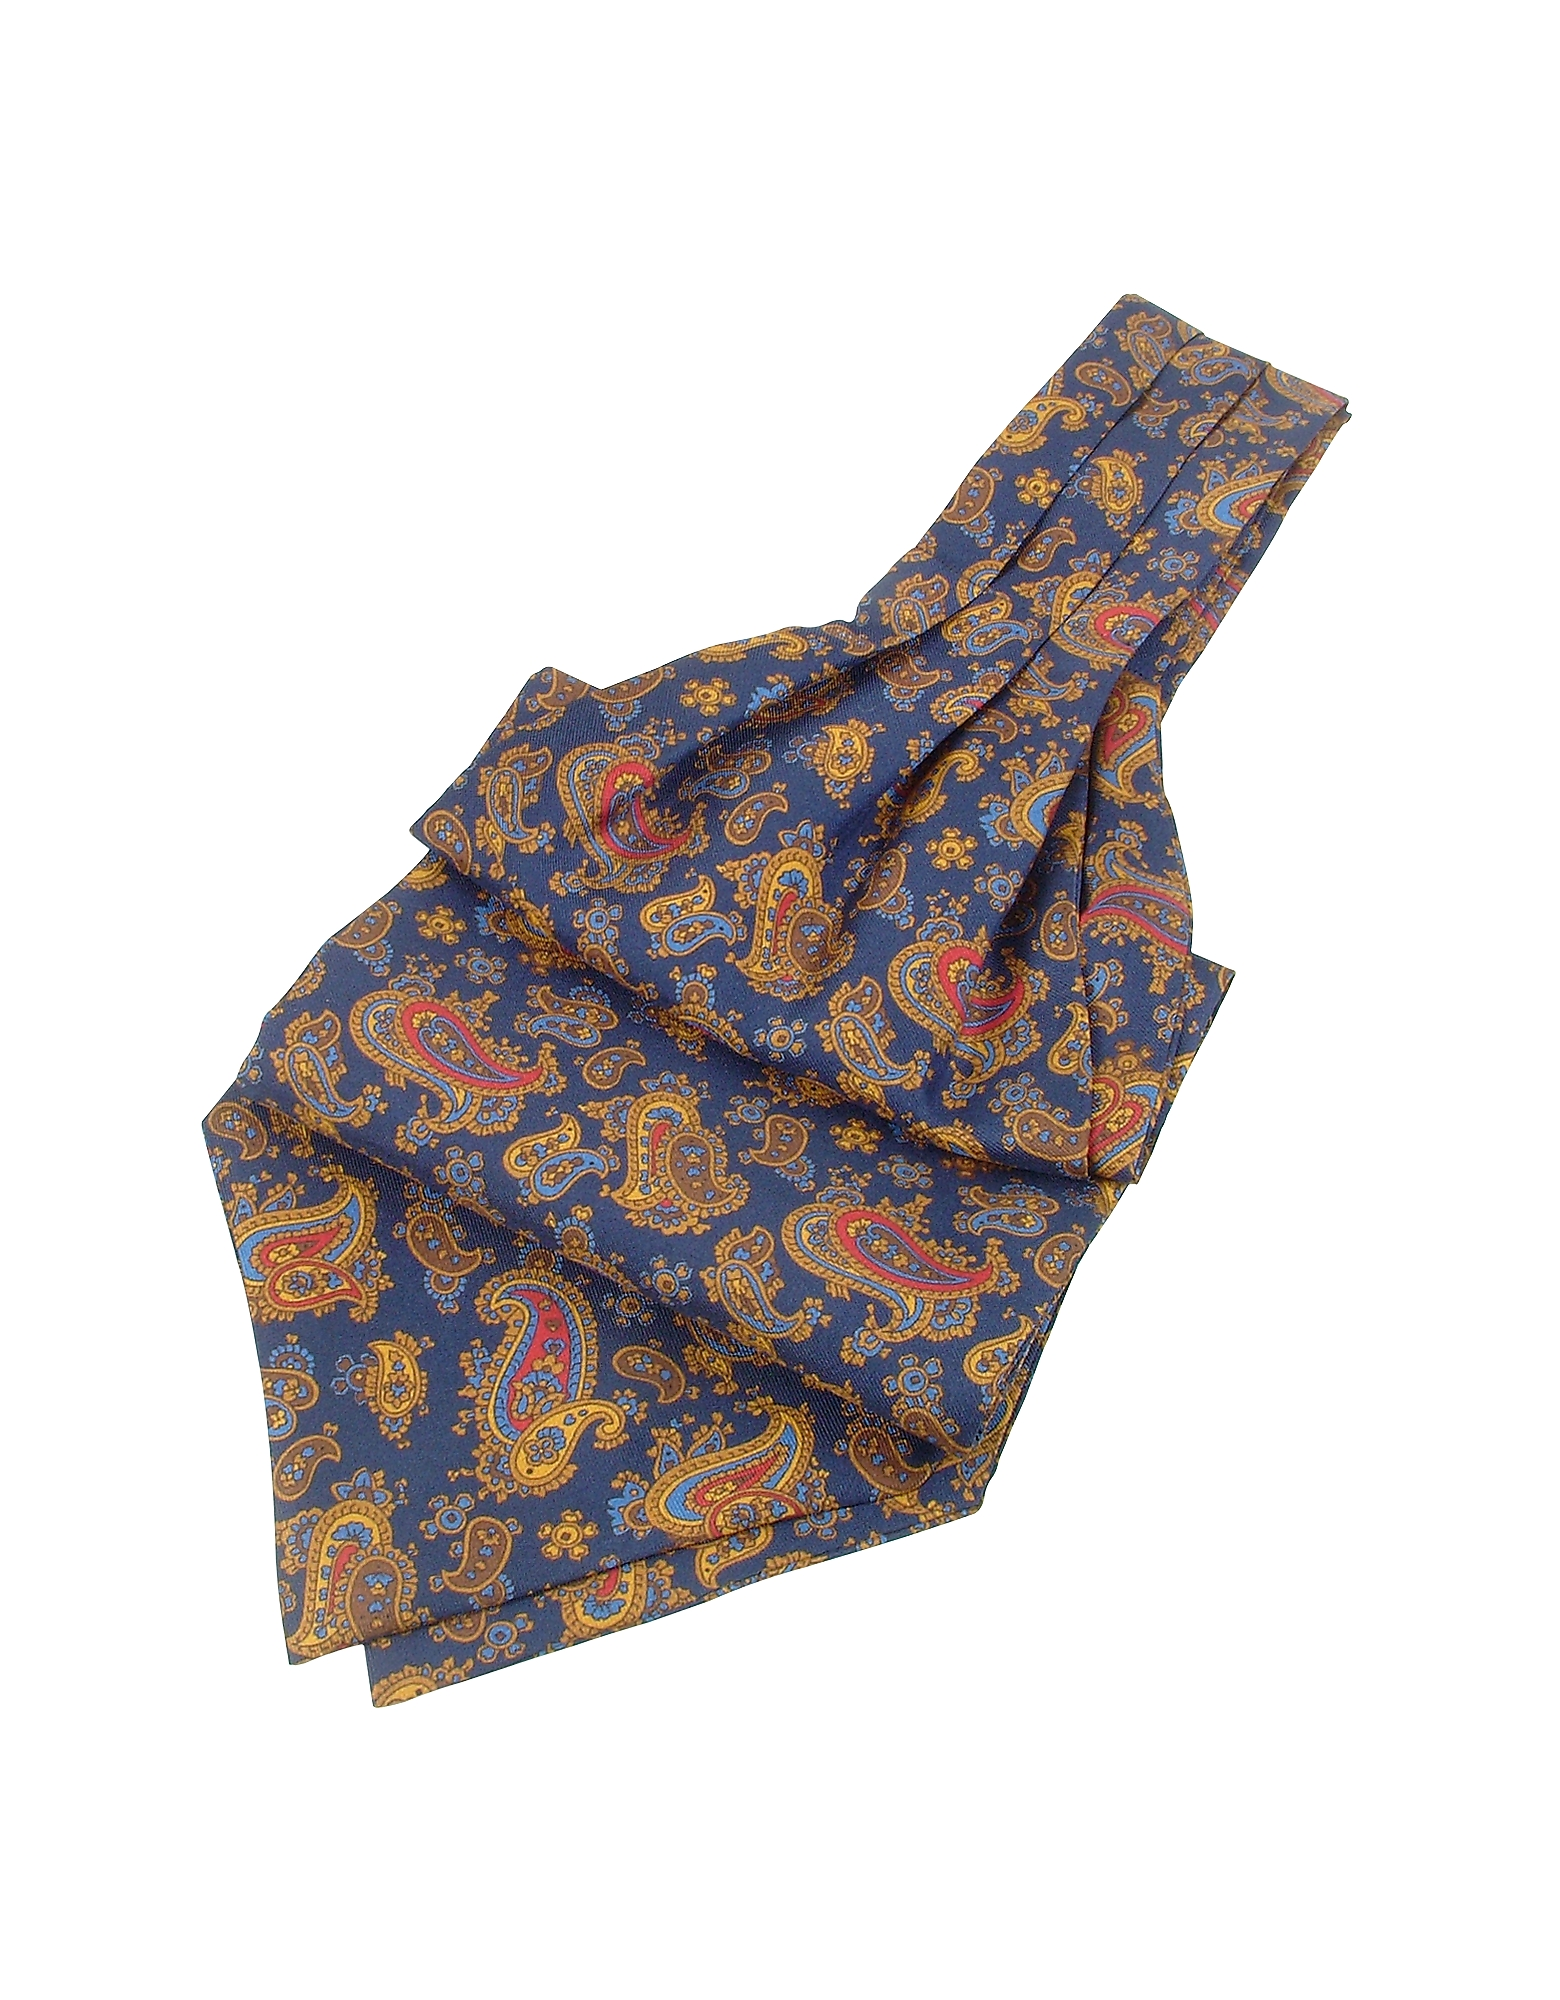 Forzieri Ascot ties, Paisley Print Twill Silk Ascot